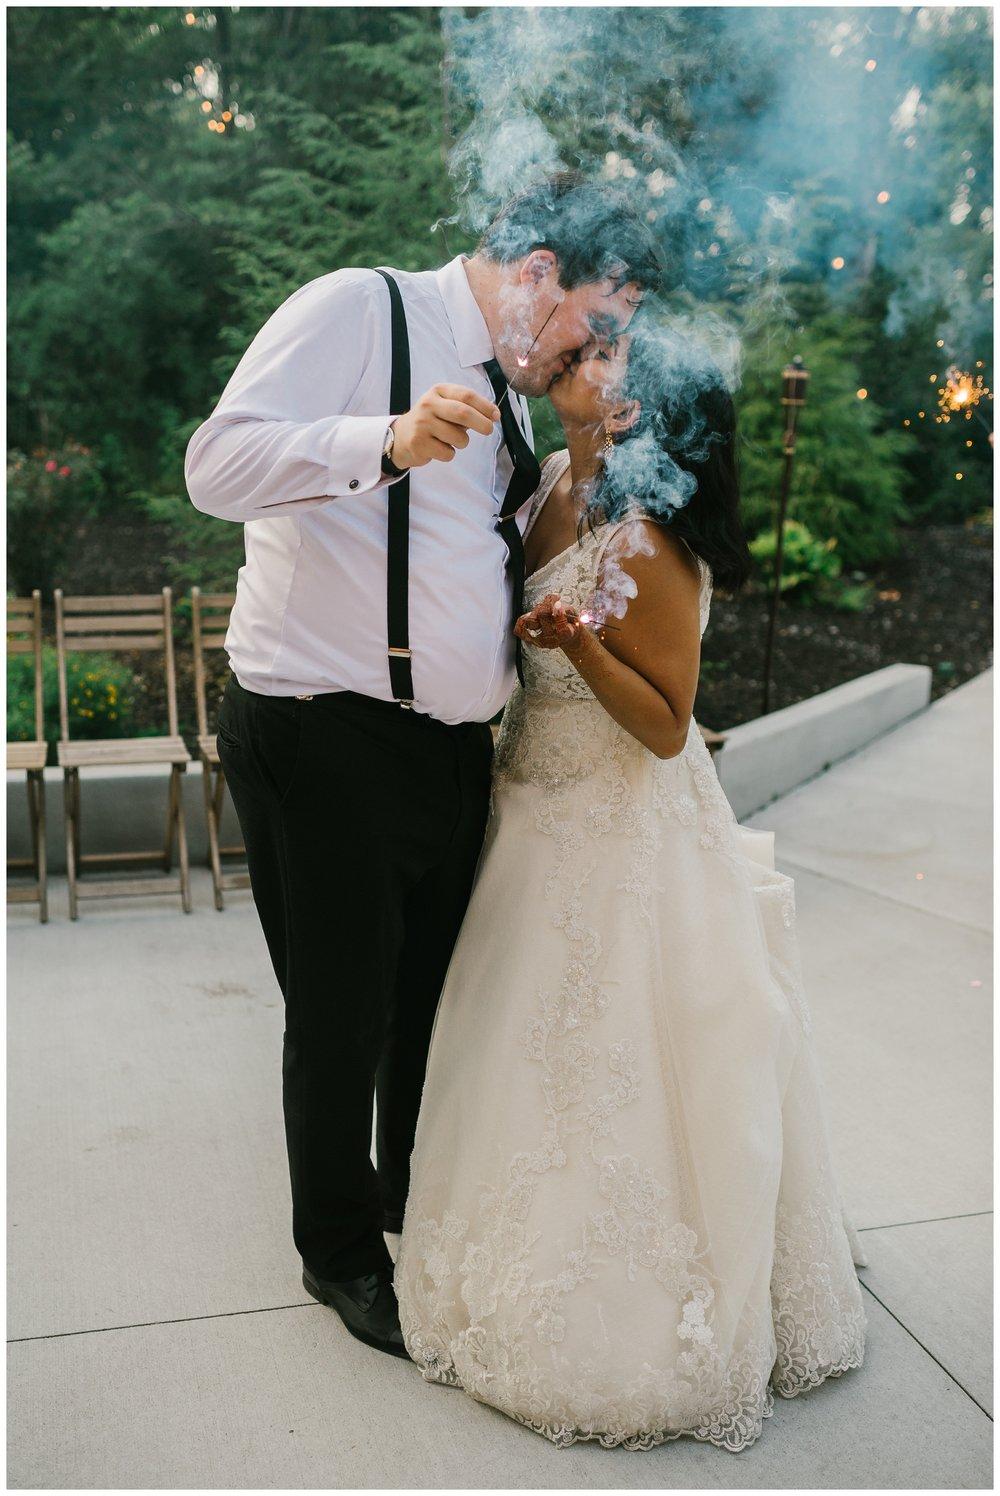 Rebecca_Bridges_Photography_Indianapolis_Wedding_Photographer_7006.jpg